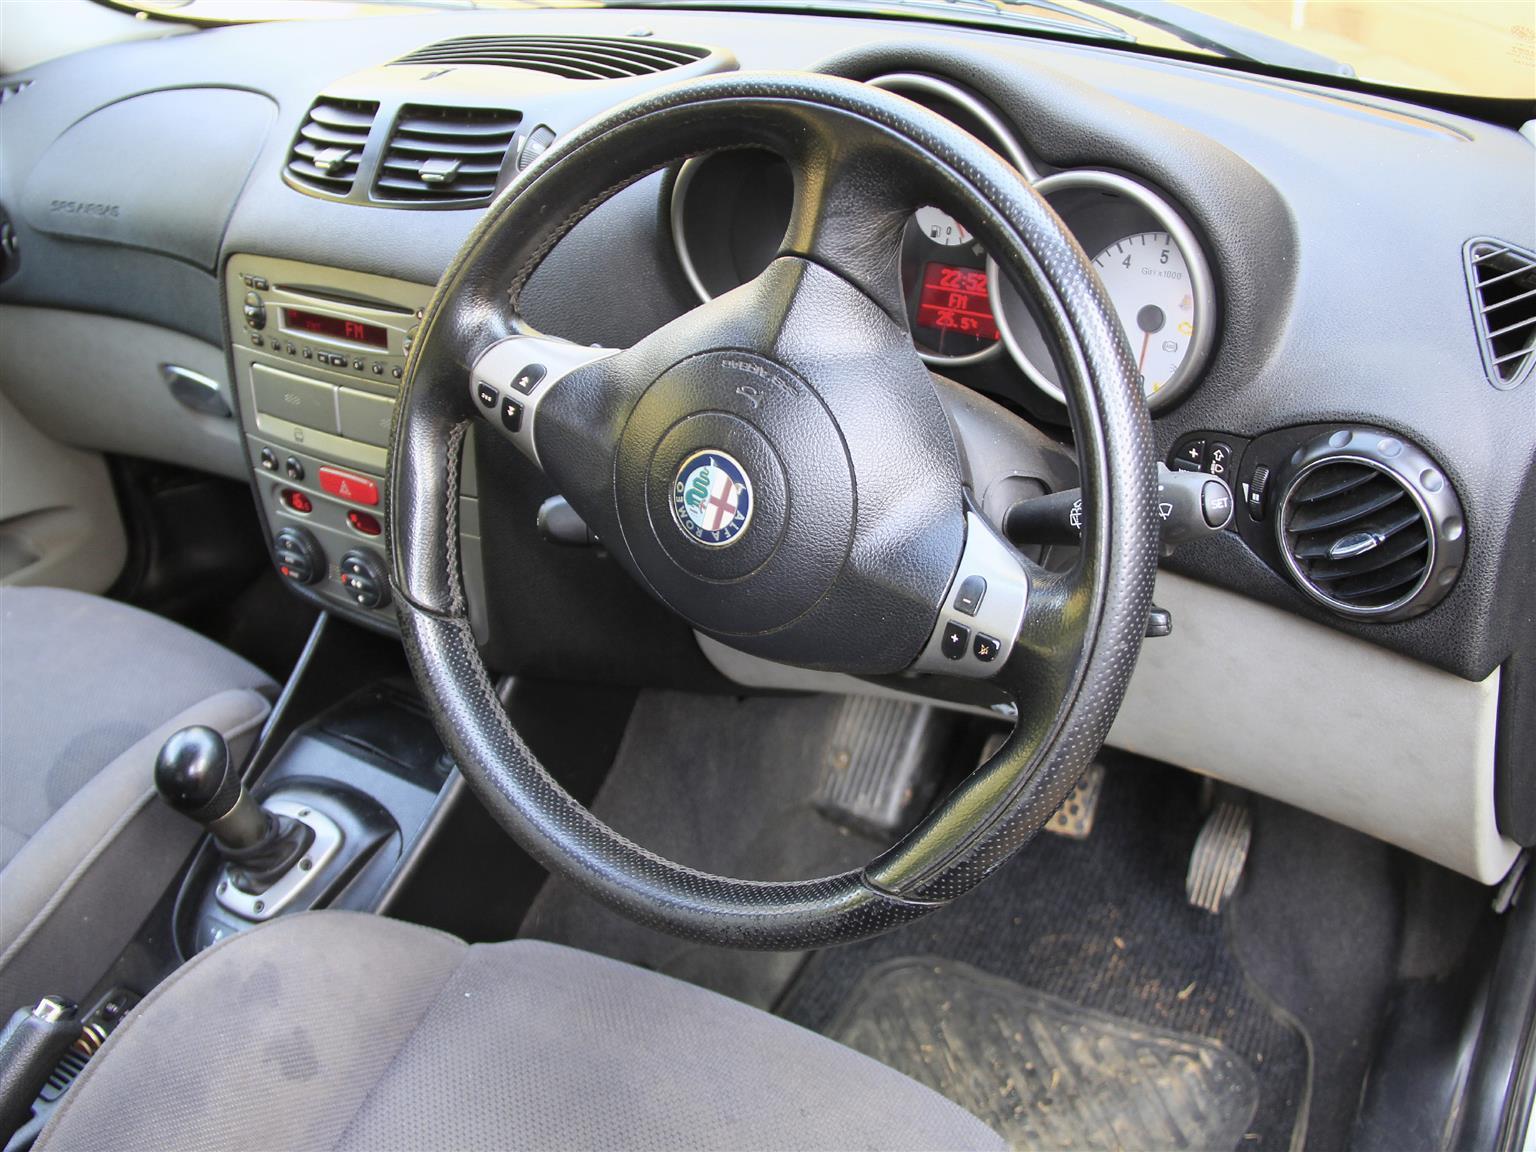 2002 Alfa Romeo 147 2.0 3 door Distinctive